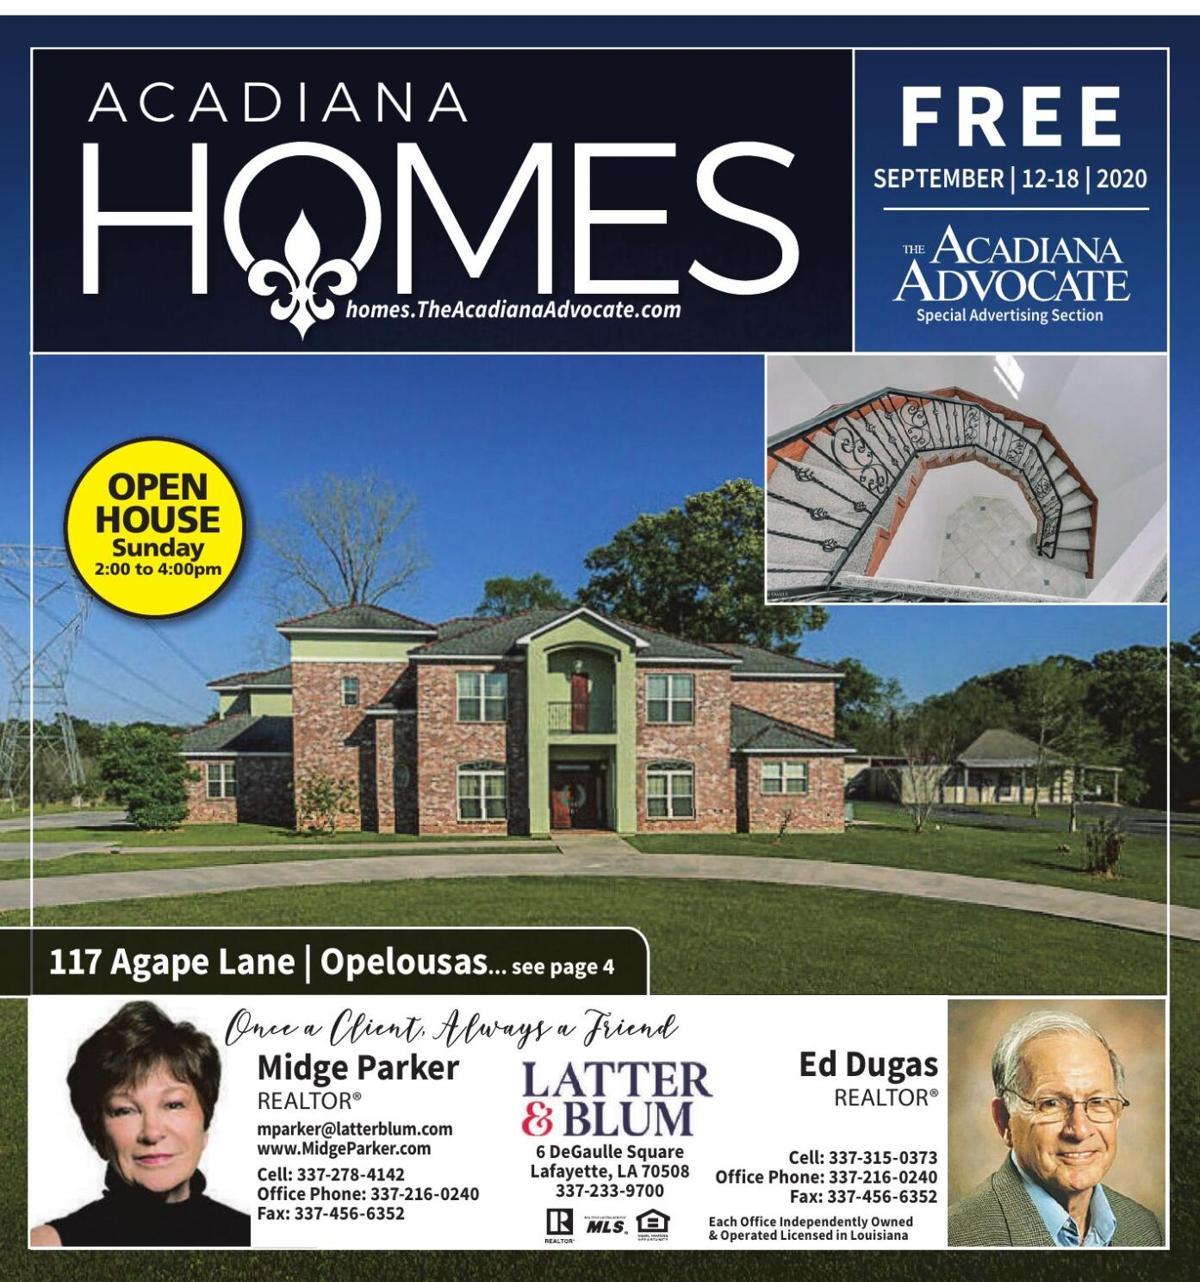 Acadiana Homes - September 12, 2020